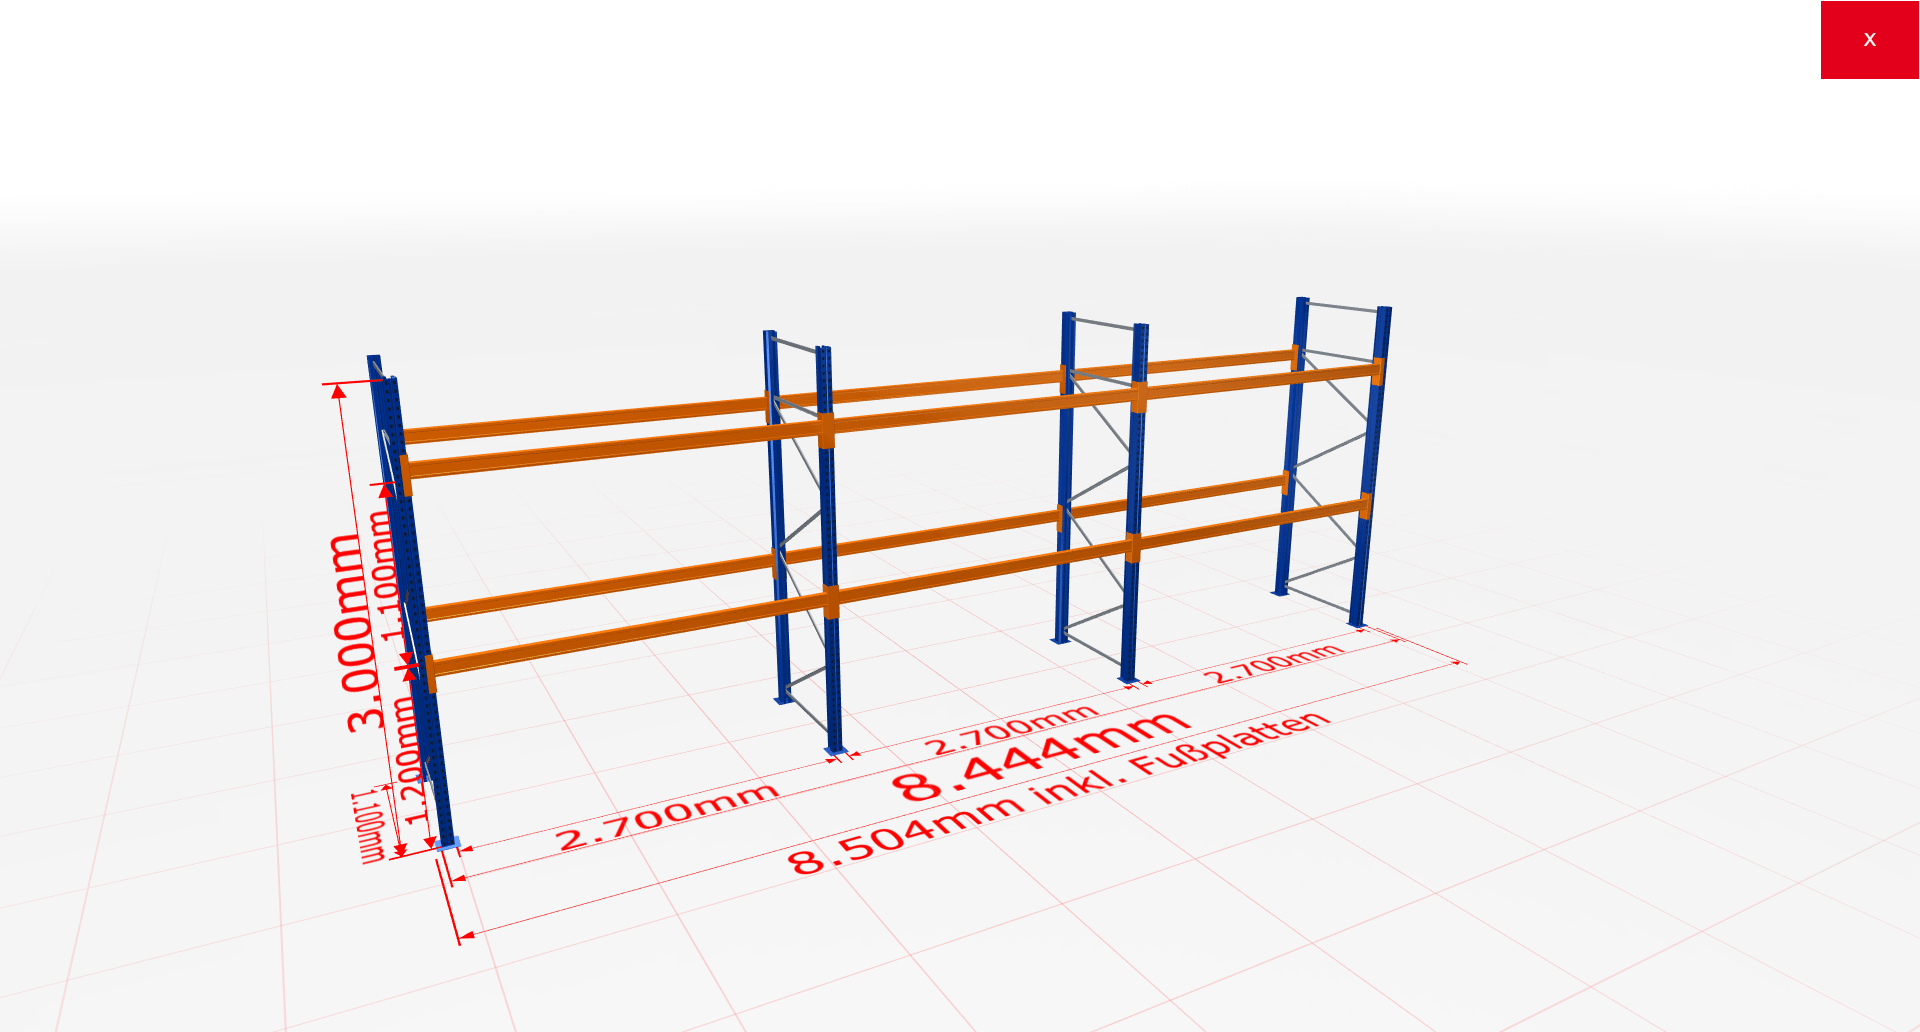 Palettenregal Komplettregal 3000x8444x1100 mm (HxBxT) 2 Fachebenen SCHULTE Lagertechnik